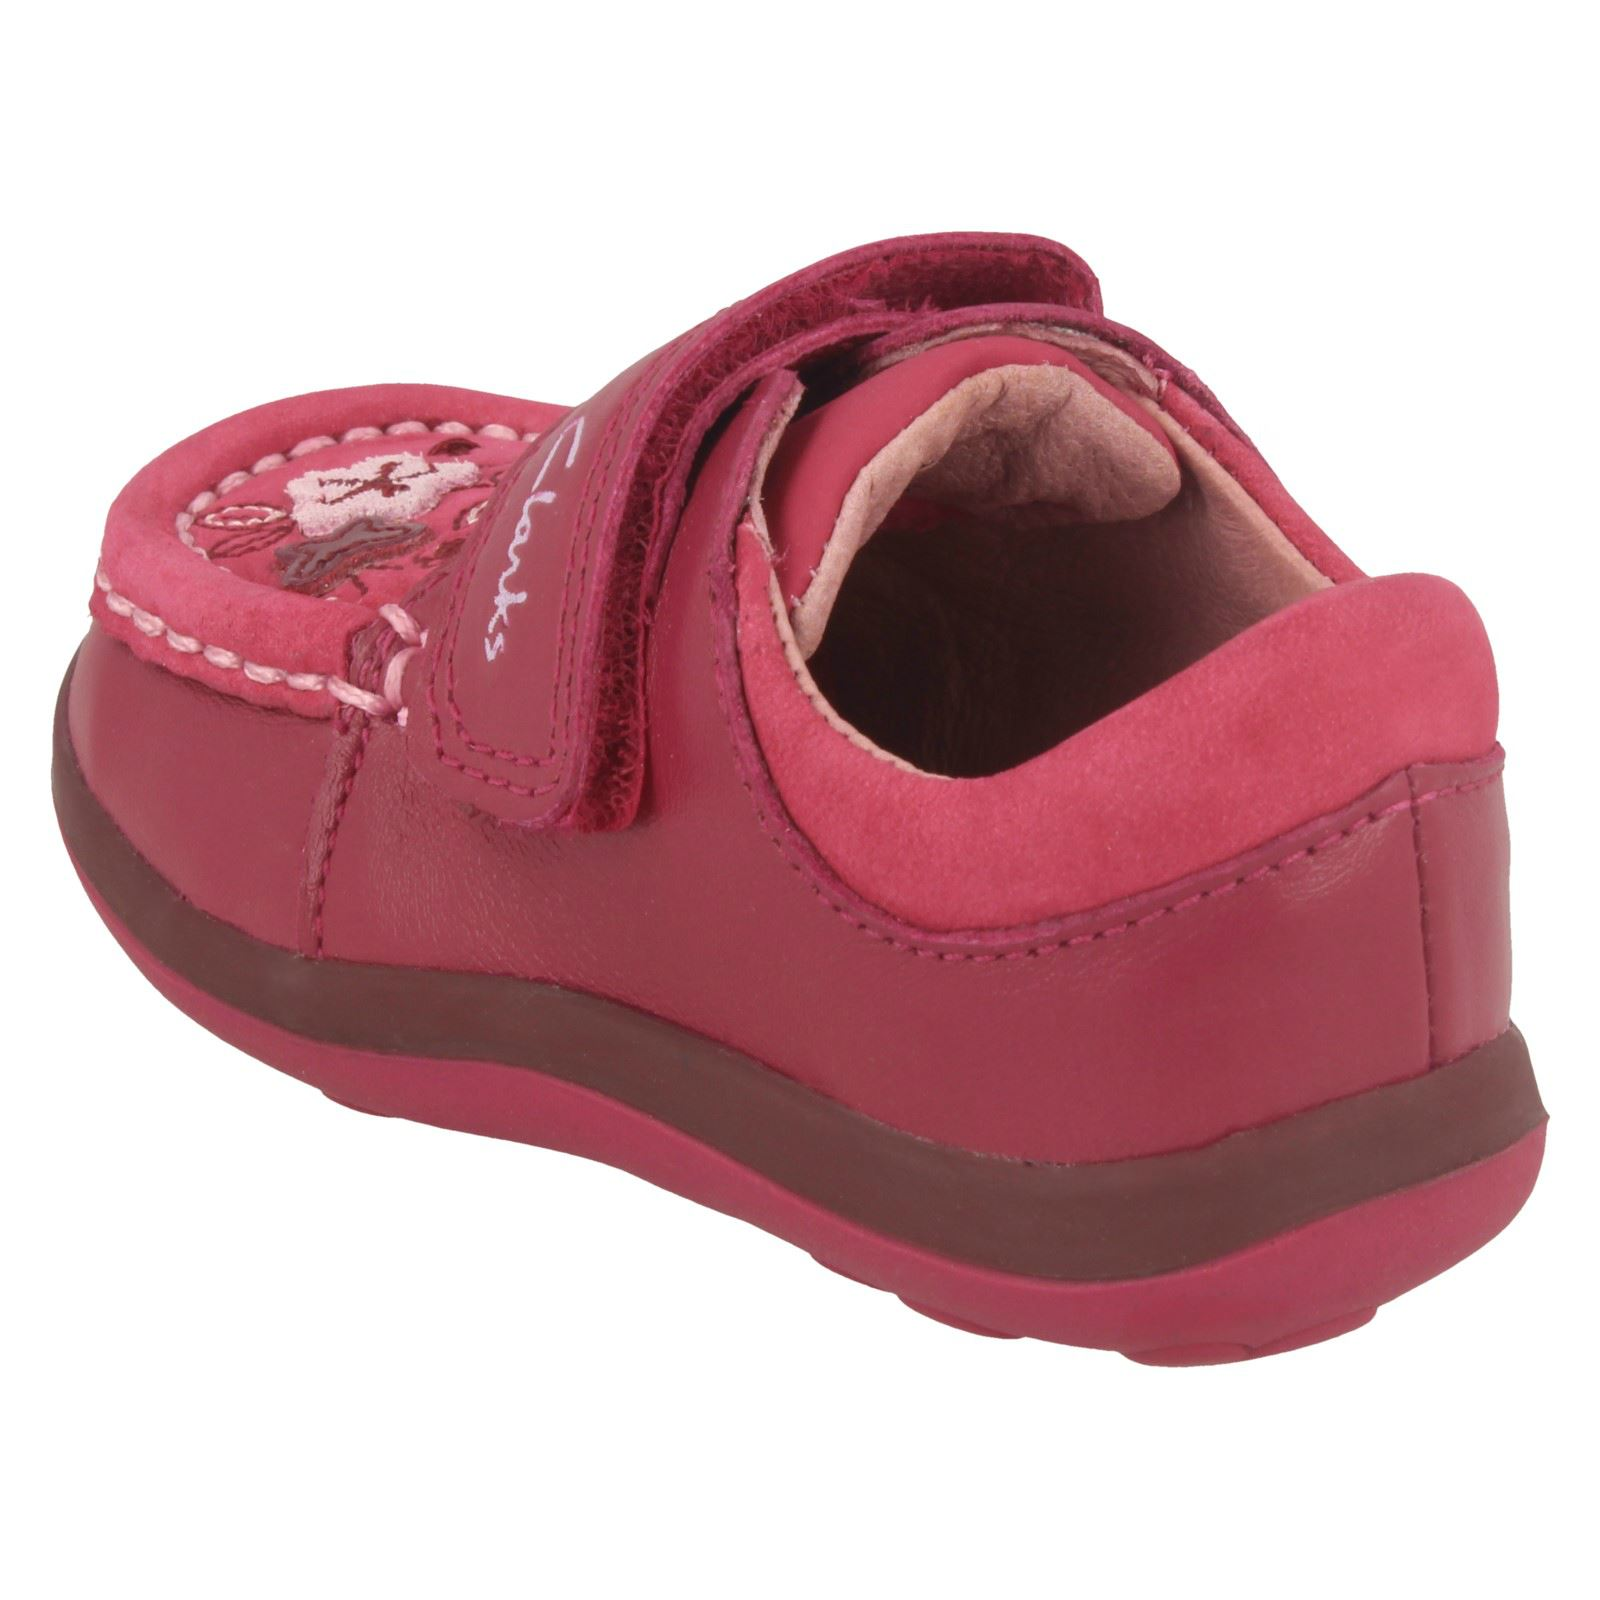 Clarks Girls Casual Shoes - Alana Lou